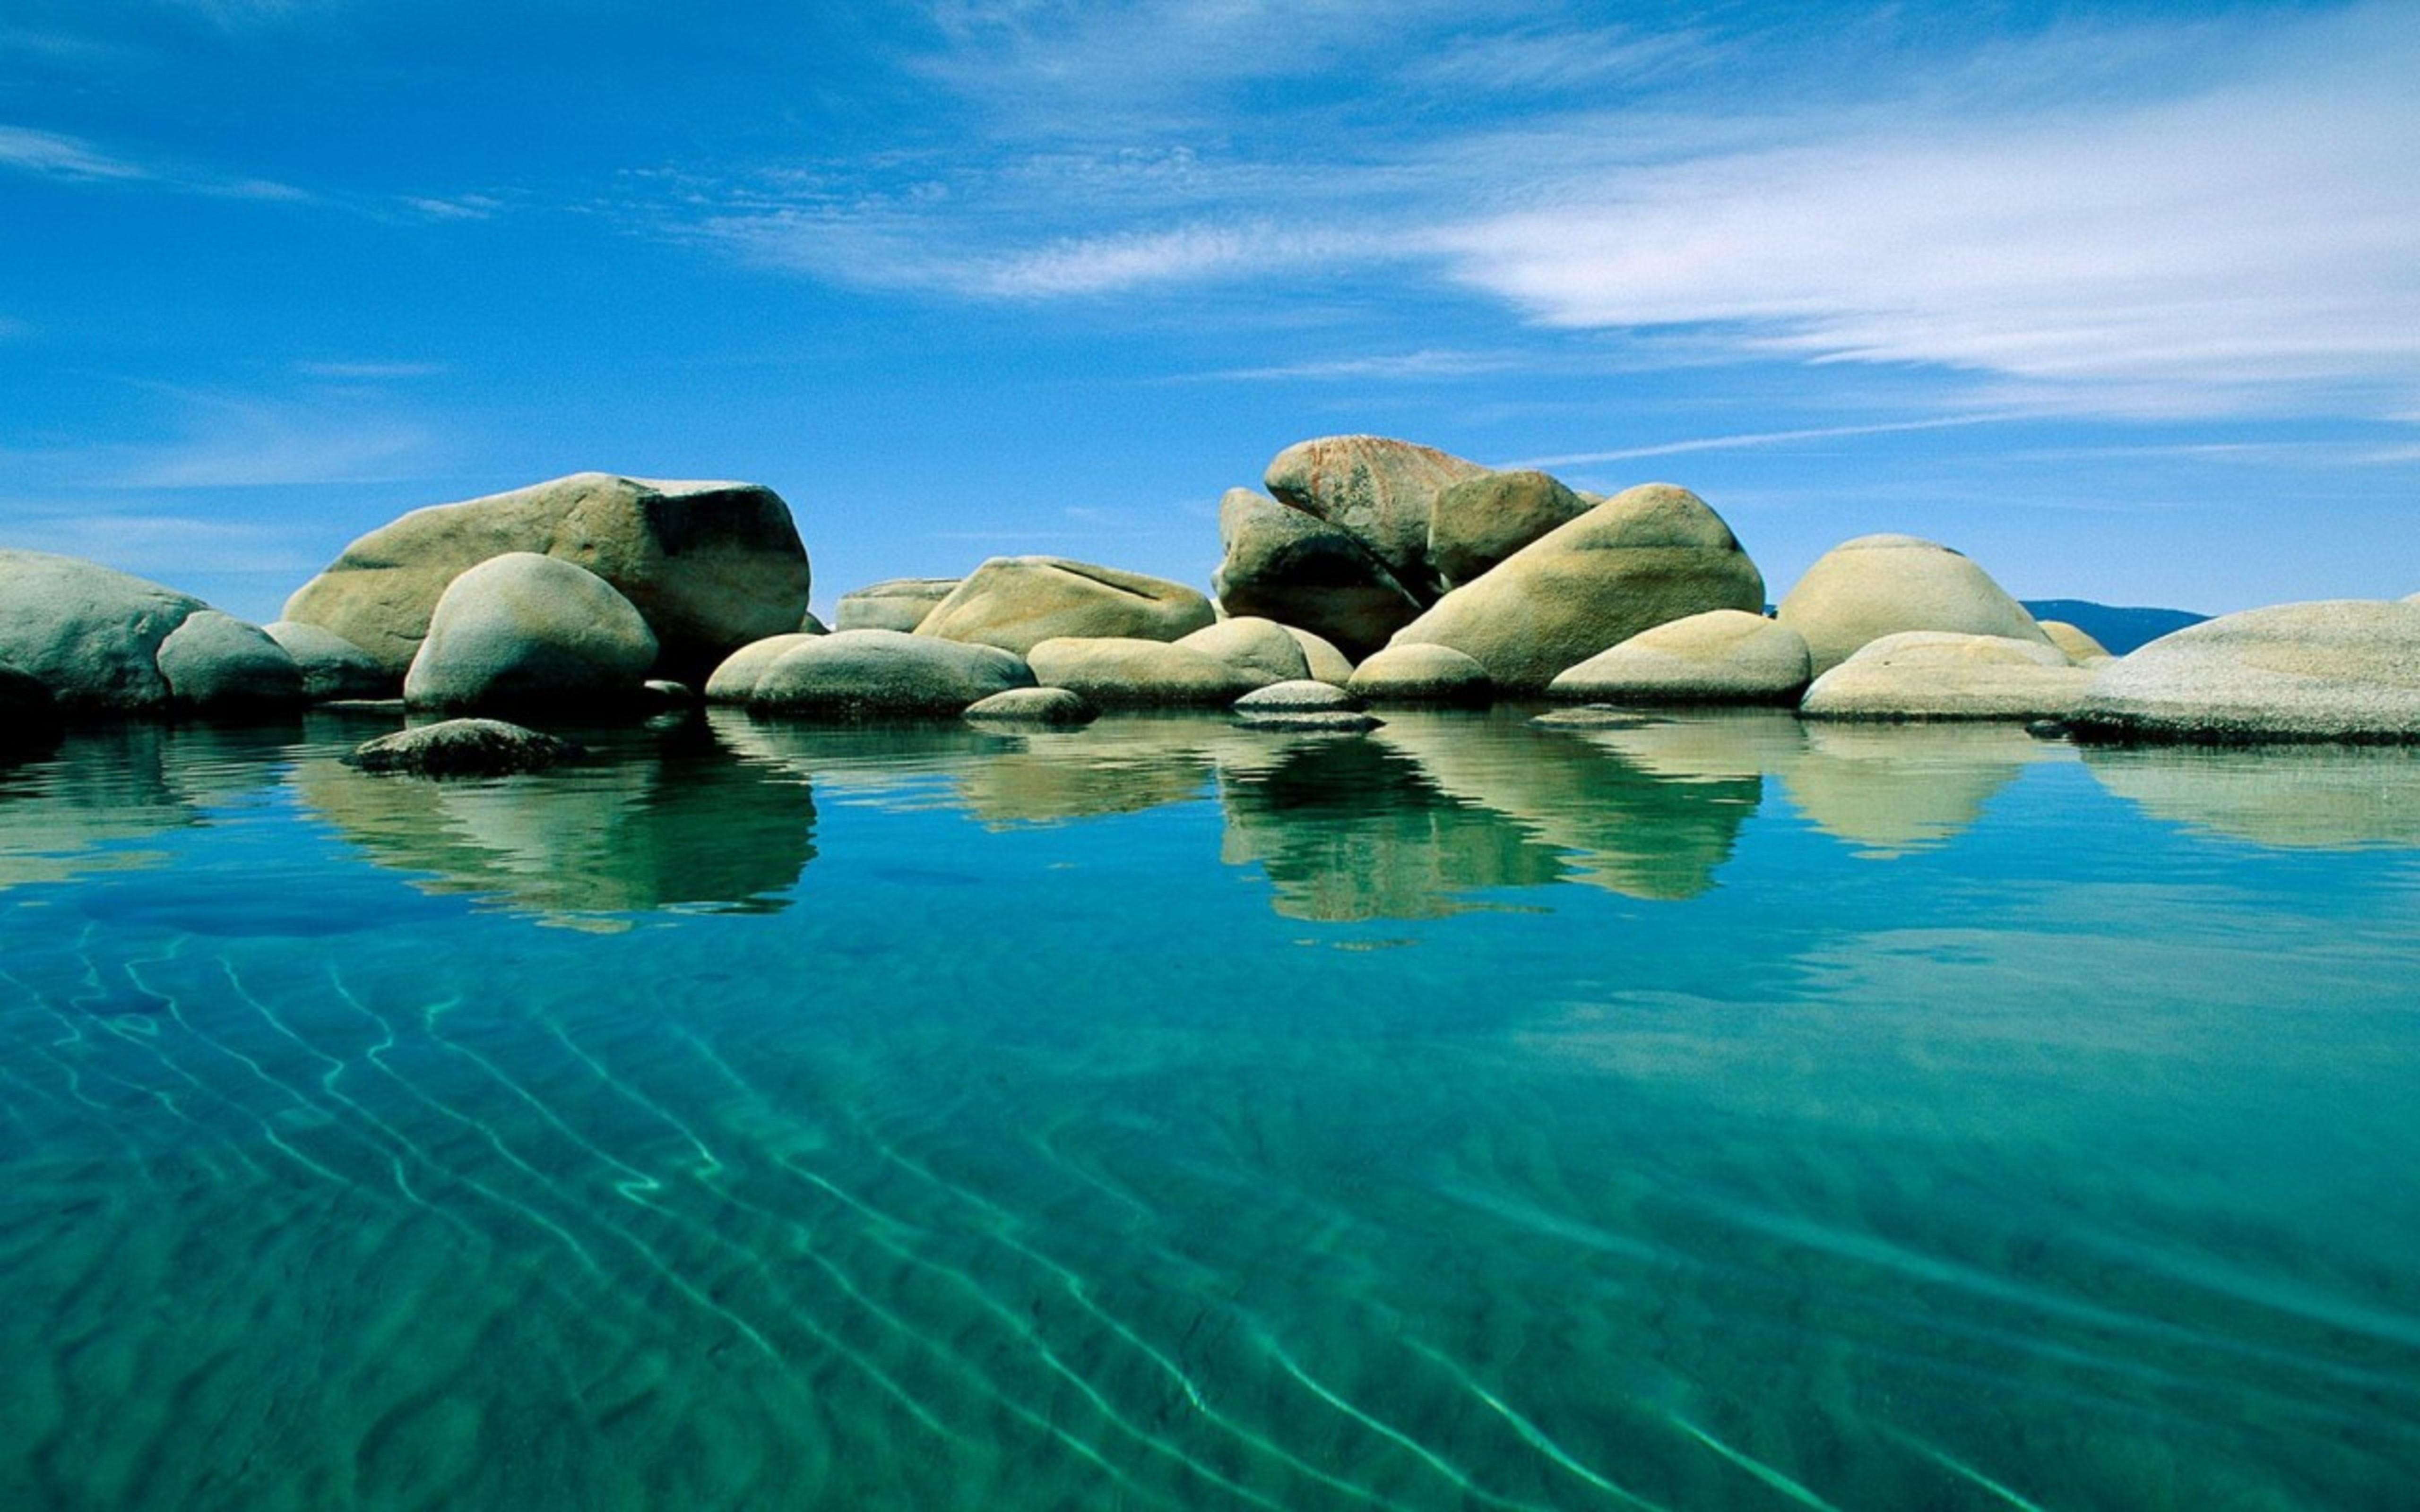 Big stones in the water   HD summer wallpaper 5120x3200